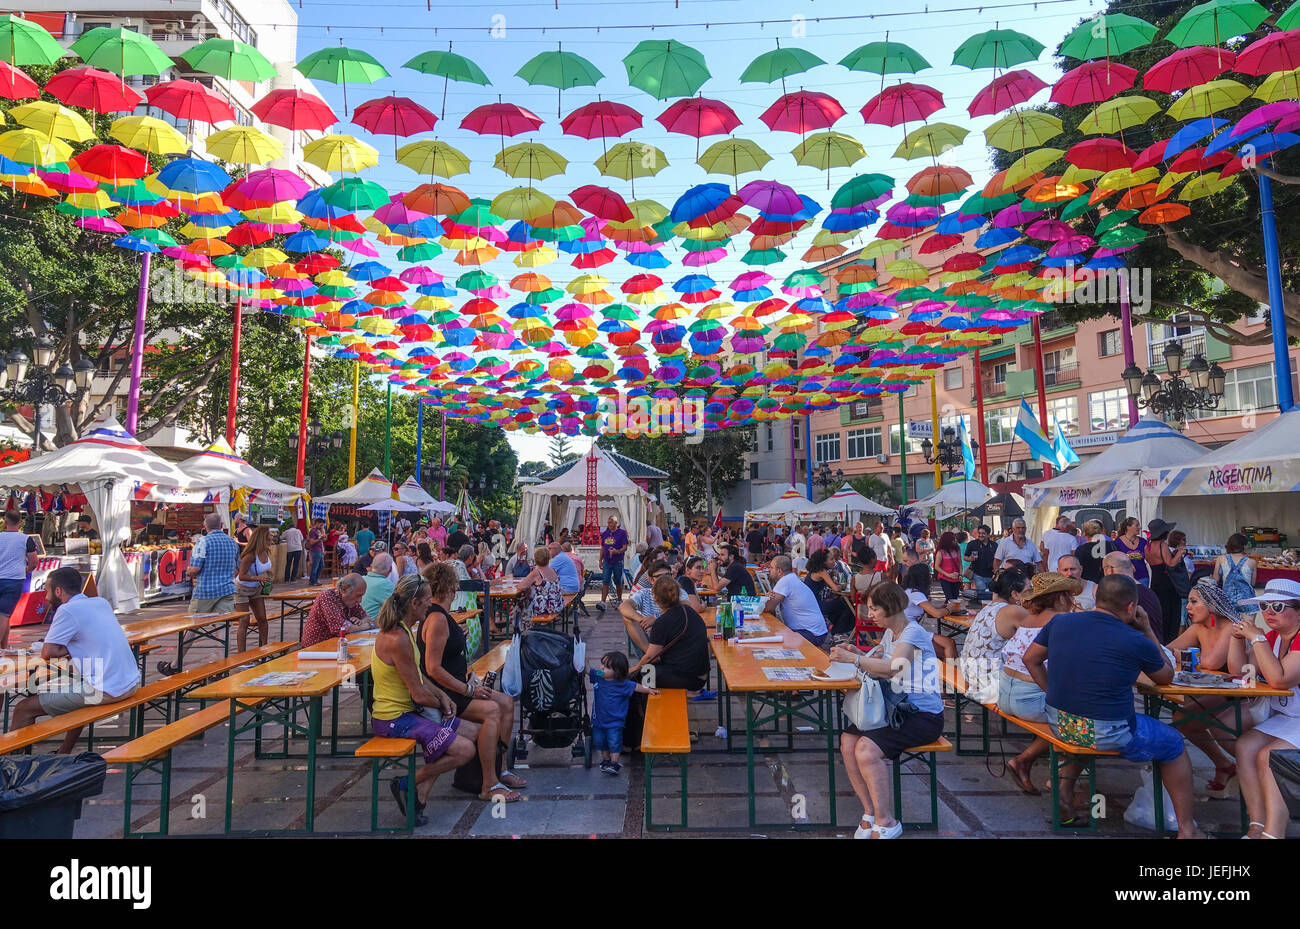 Festival de comida de diferentes culturas, Torremolinos, Málaga, Andalucía. Foto de stock